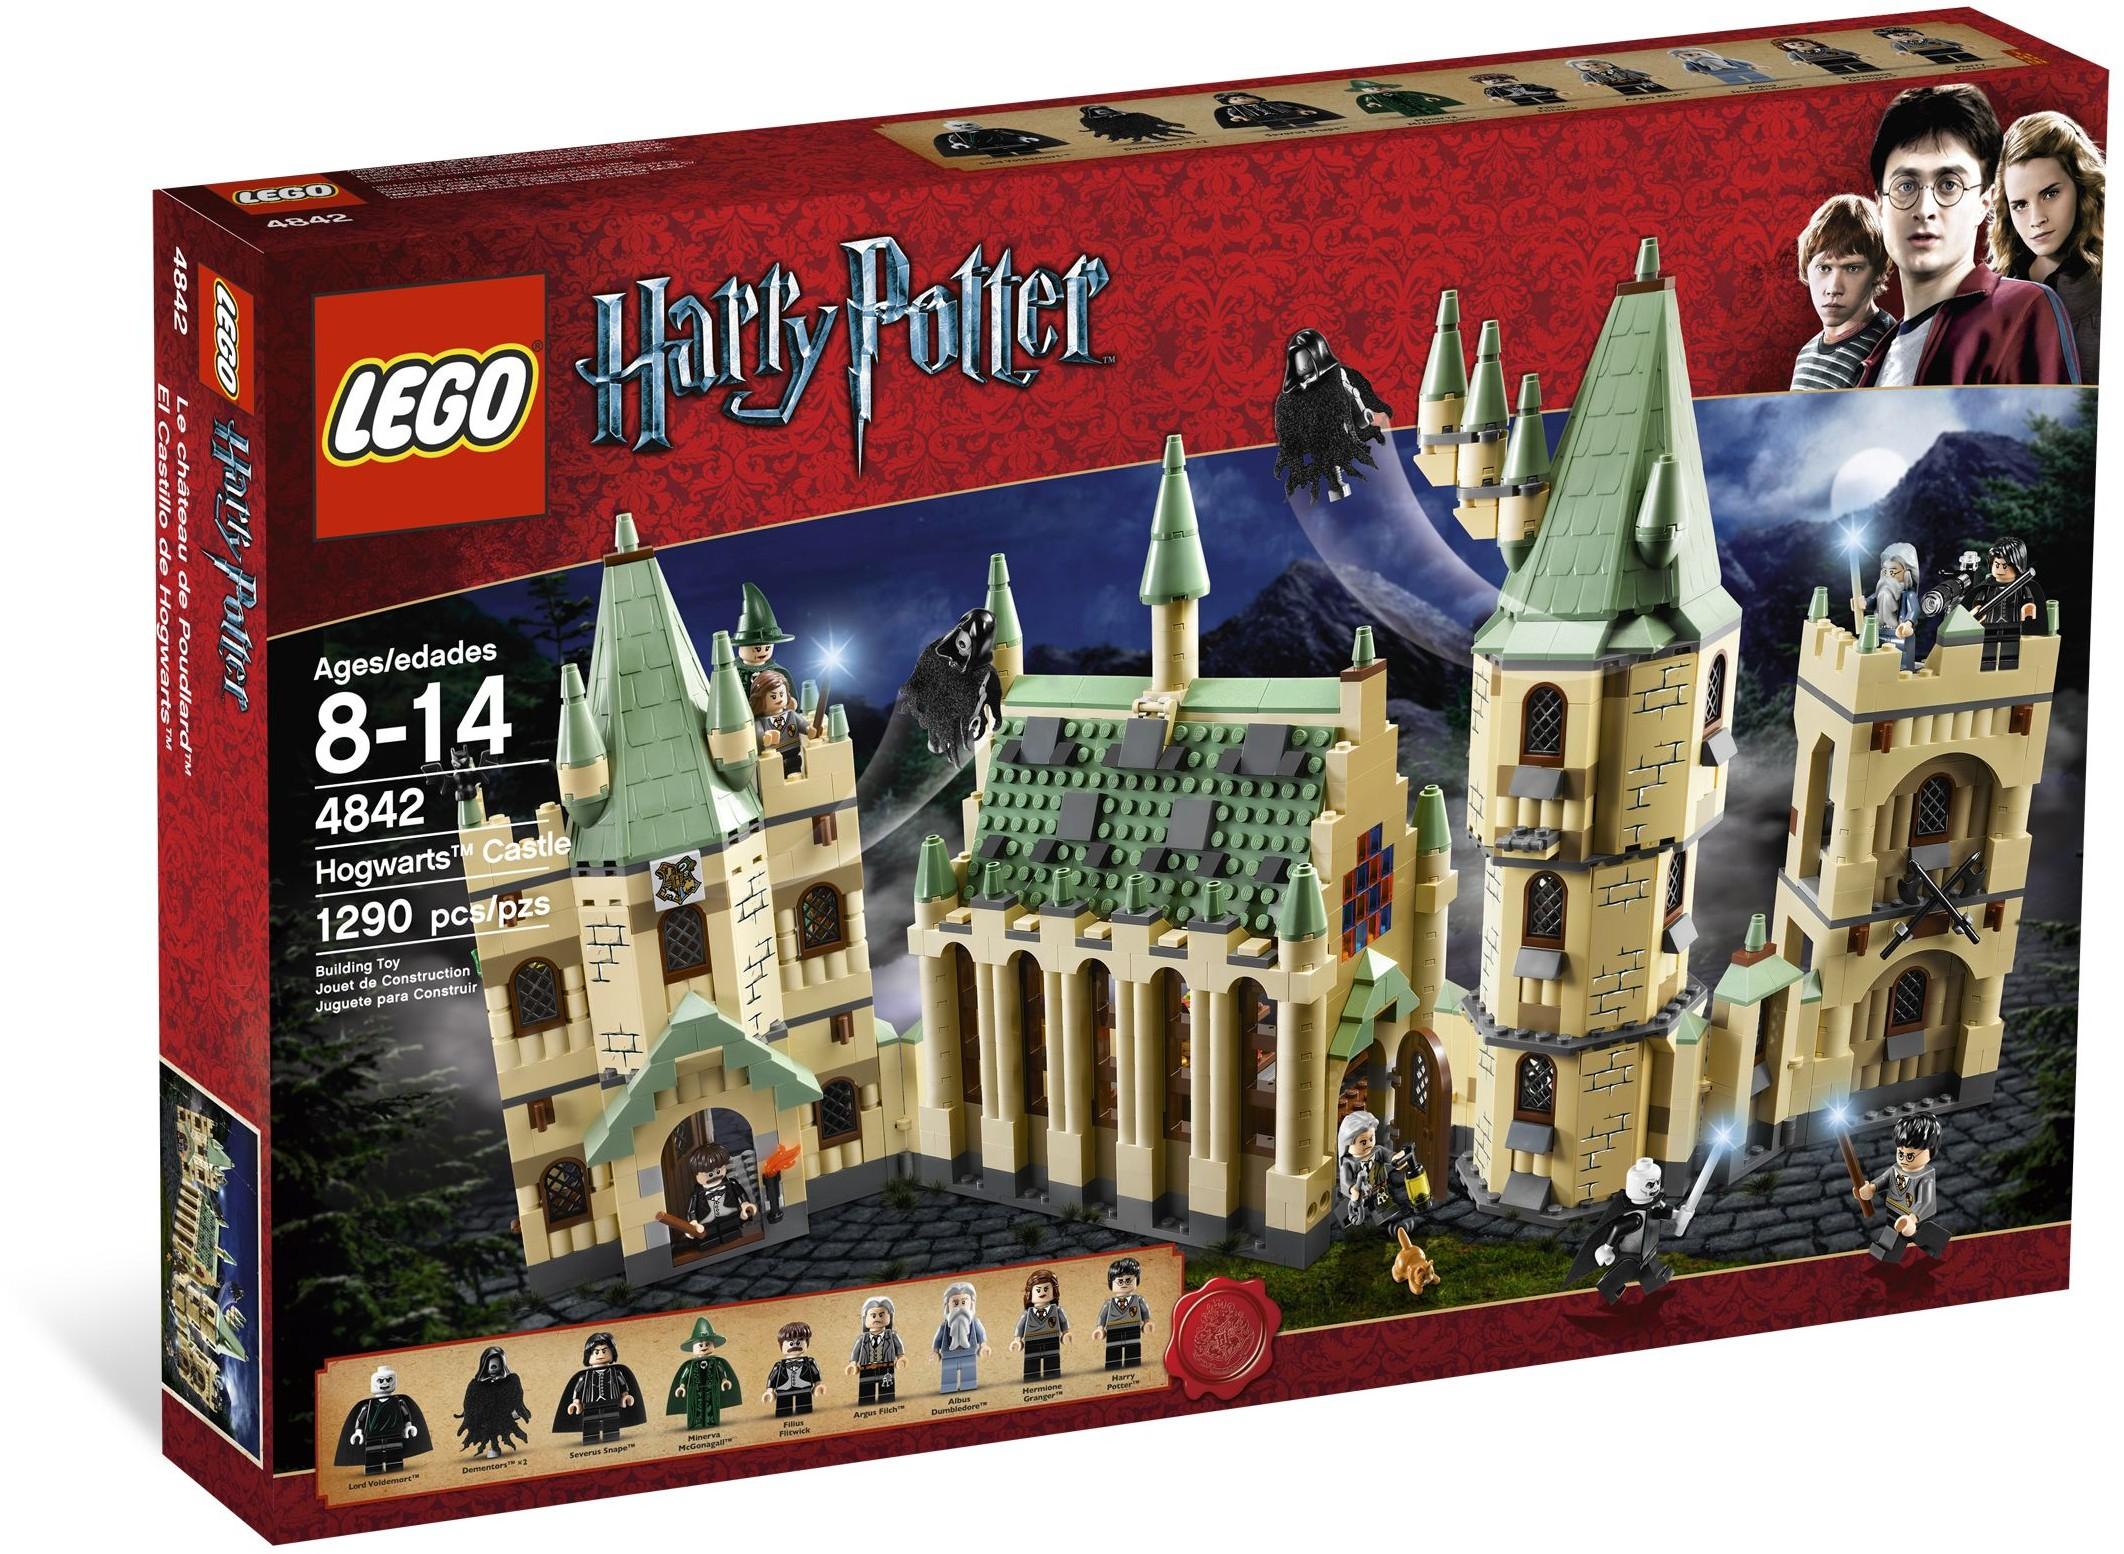 lego harry potter hogwarts castle d2c set in 2018 the brick fan the brick fan. Black Bedroom Furniture Sets. Home Design Ideas